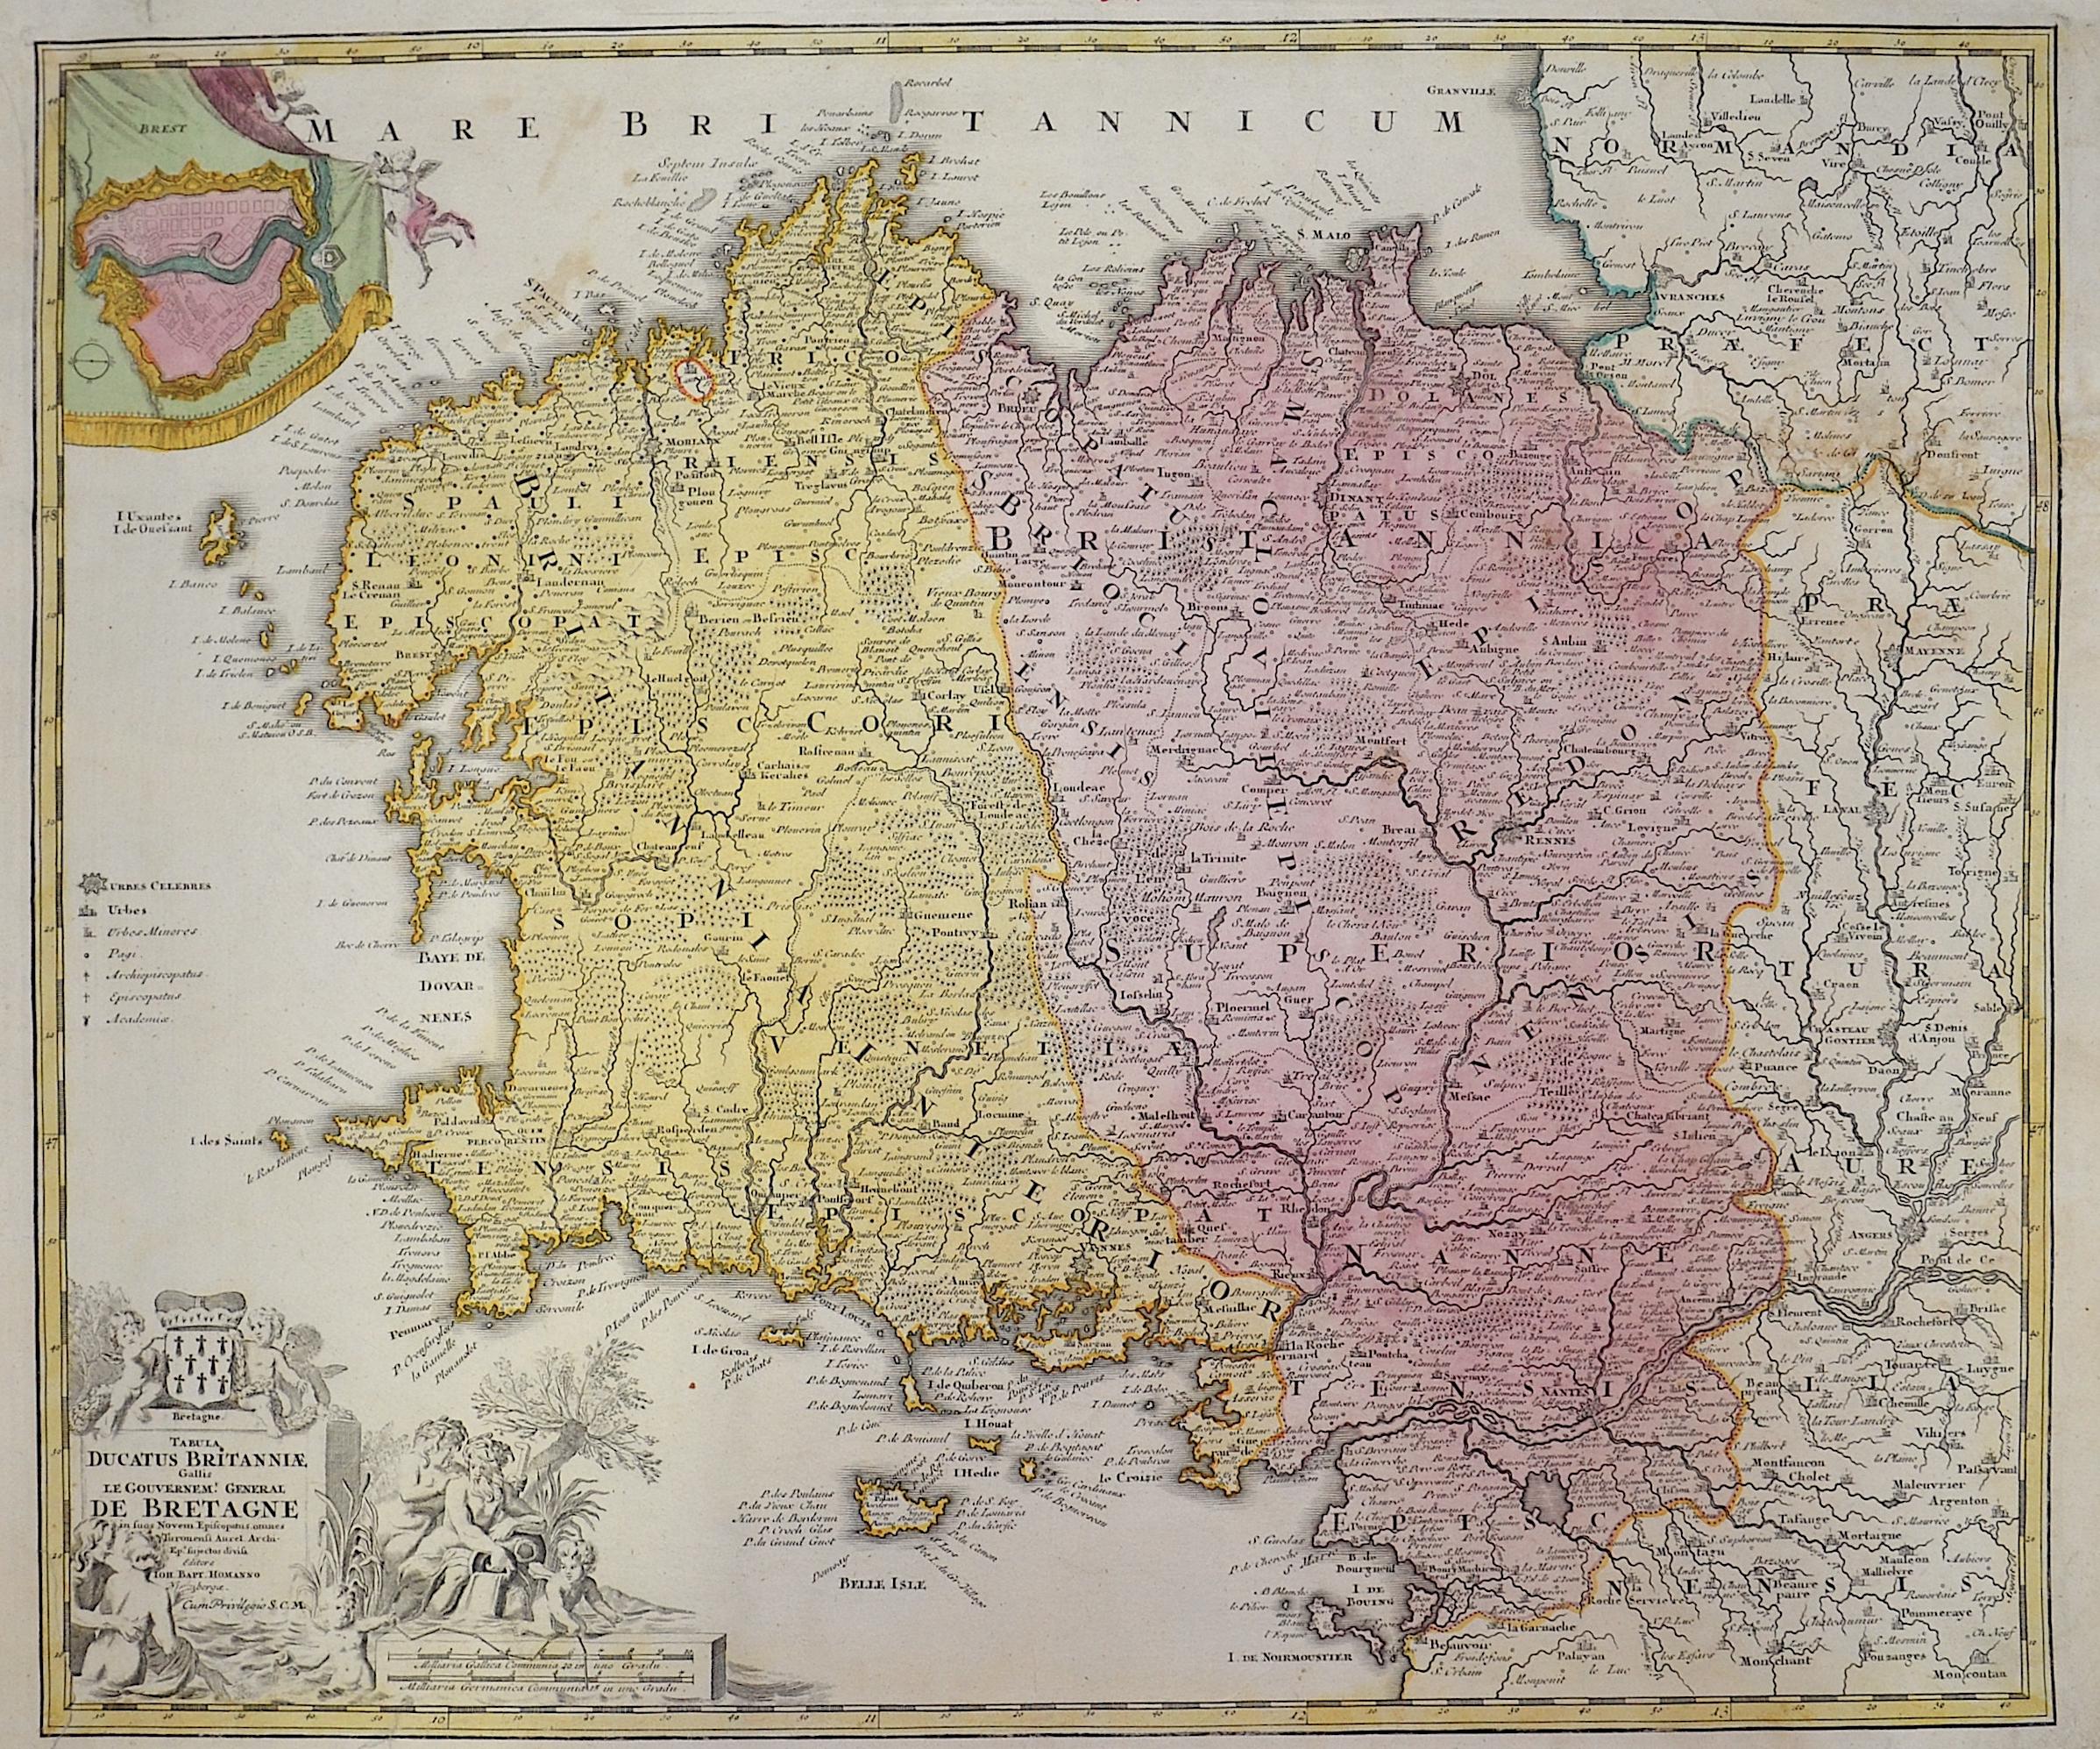 Homann Johann Babtiste Tabula Ducatus Britanniae Gallis le Gouvernemt General de Bretagne